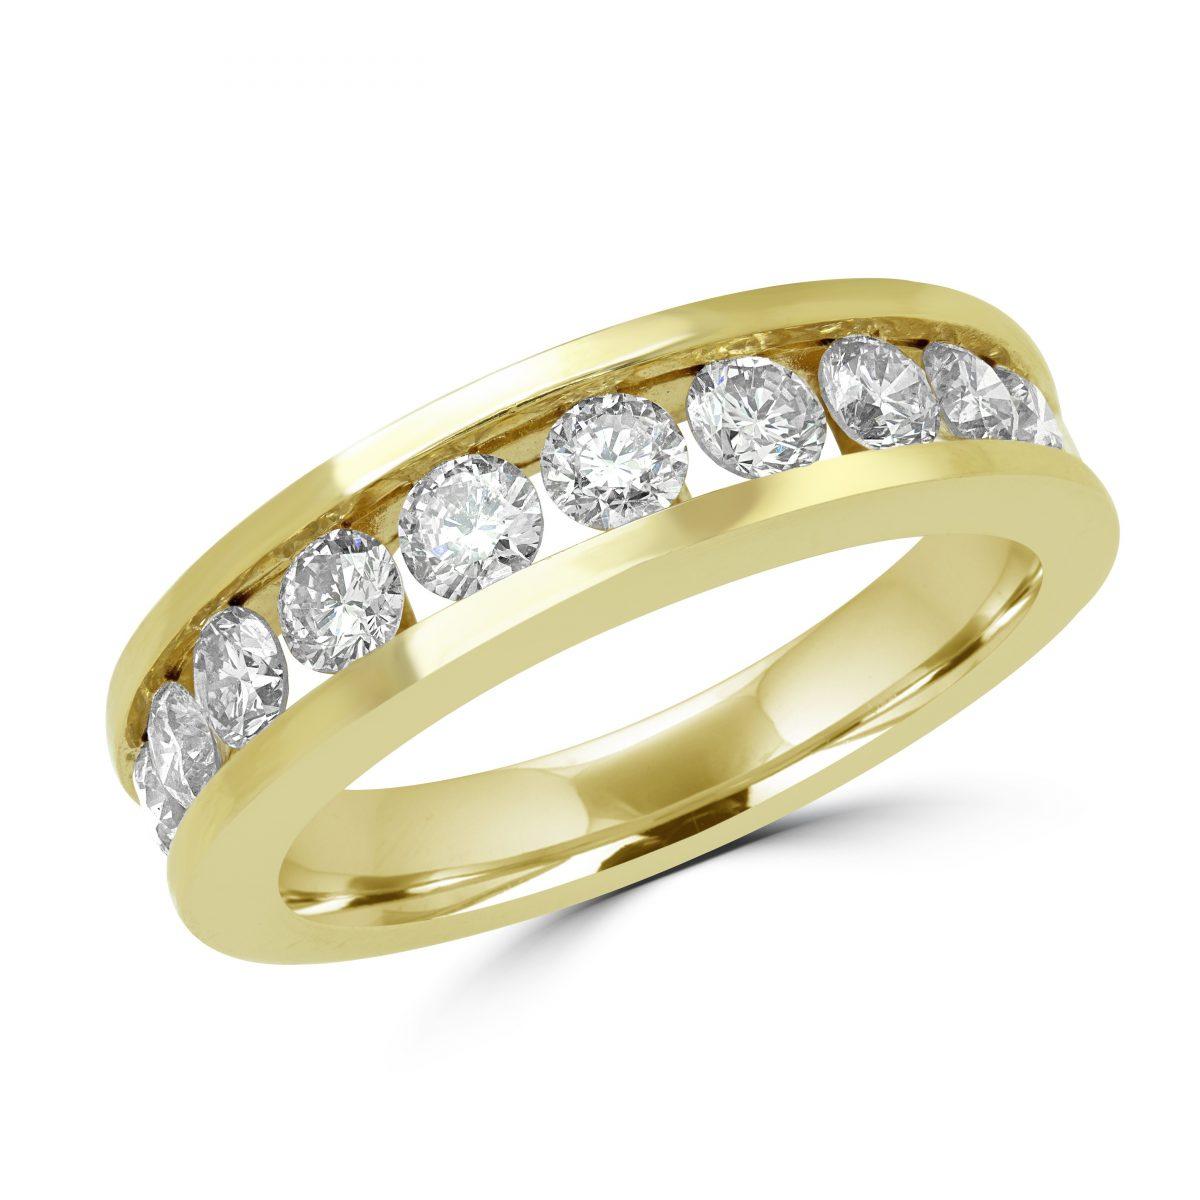 135 CT CHANNEL SET ROUND DIAMOND ETERNITY WEDDING BAND ANNIVERSARY